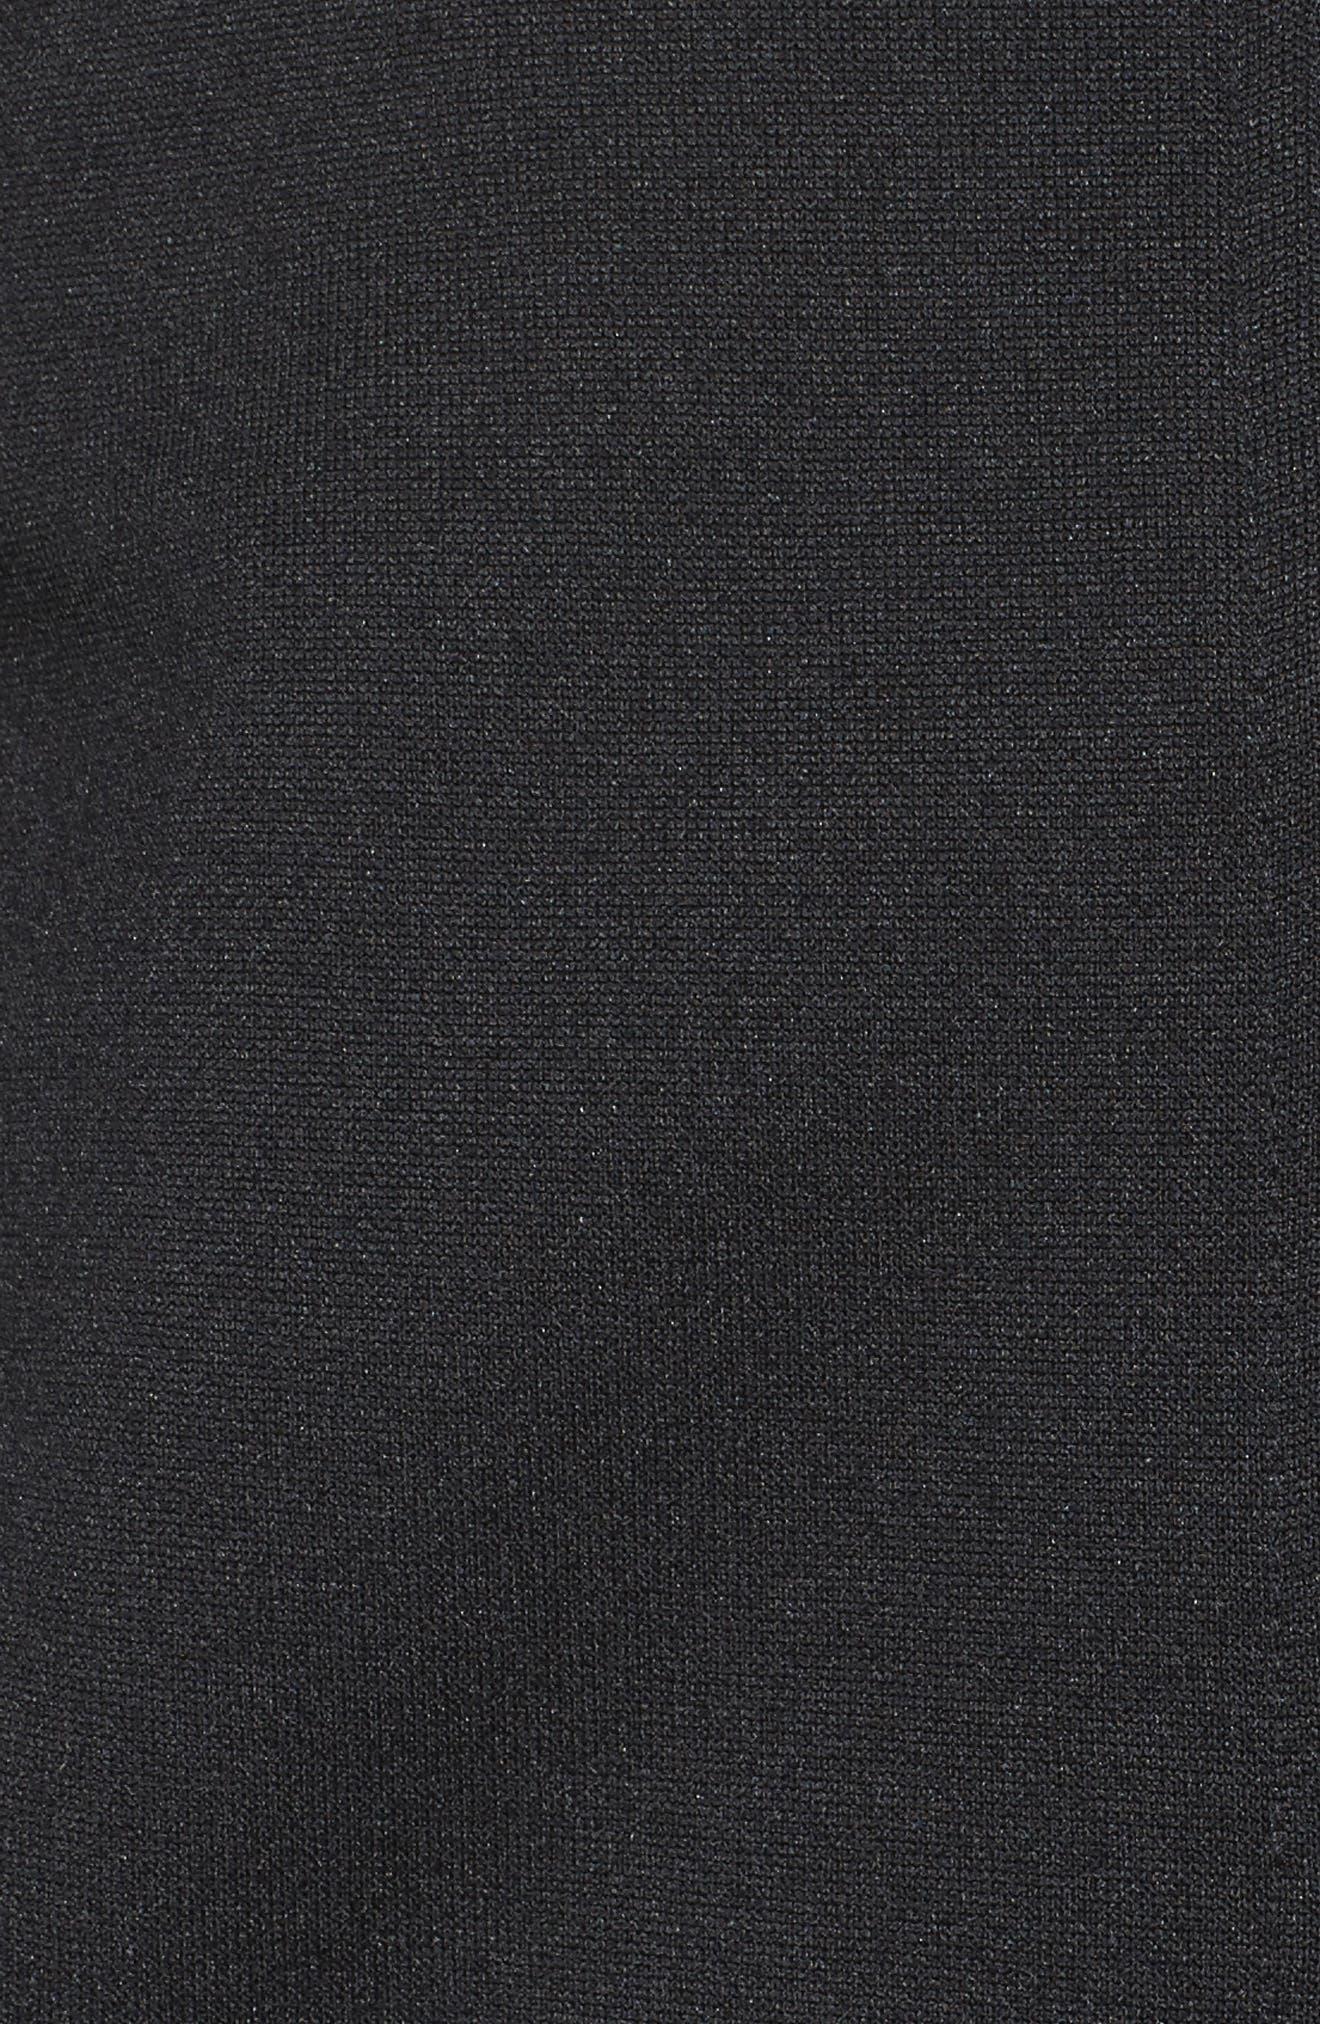 Sportswear N98 Jacket,                             Alternate thumbnail 6, color,                             010